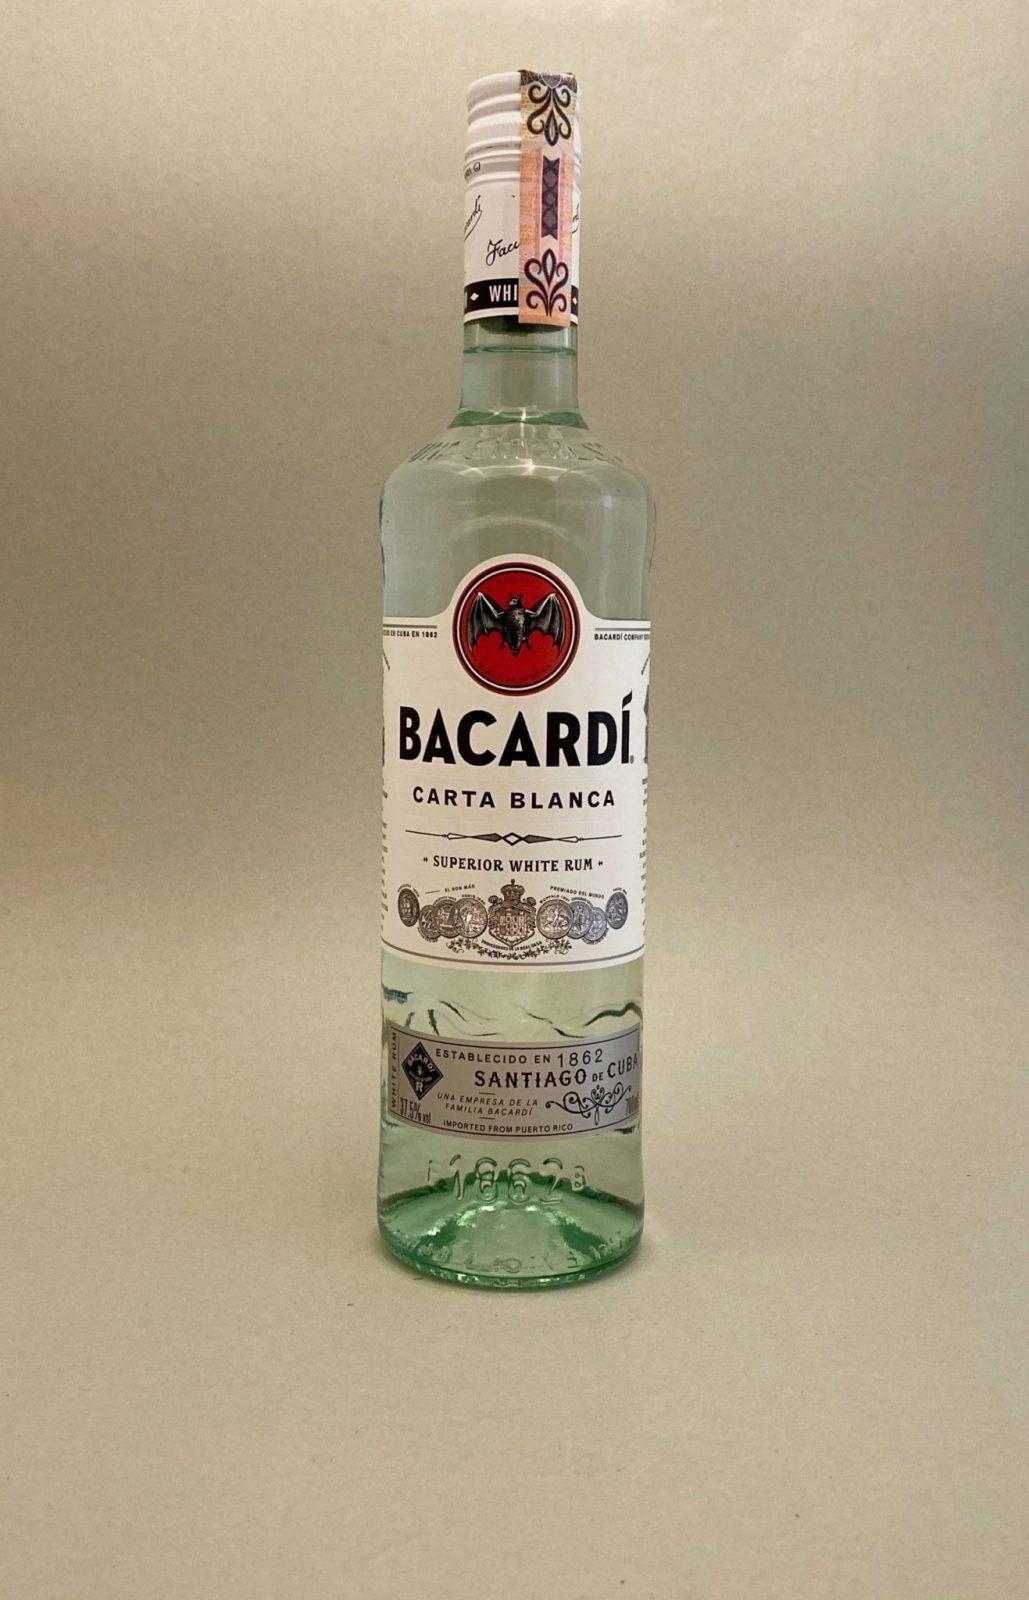 Bacardi Carta Blanca 37,5%, Bottleshop Sunny wines slnecnice mesto, petrzalka, rum, rumy, rozvoz alkoholu, eshop